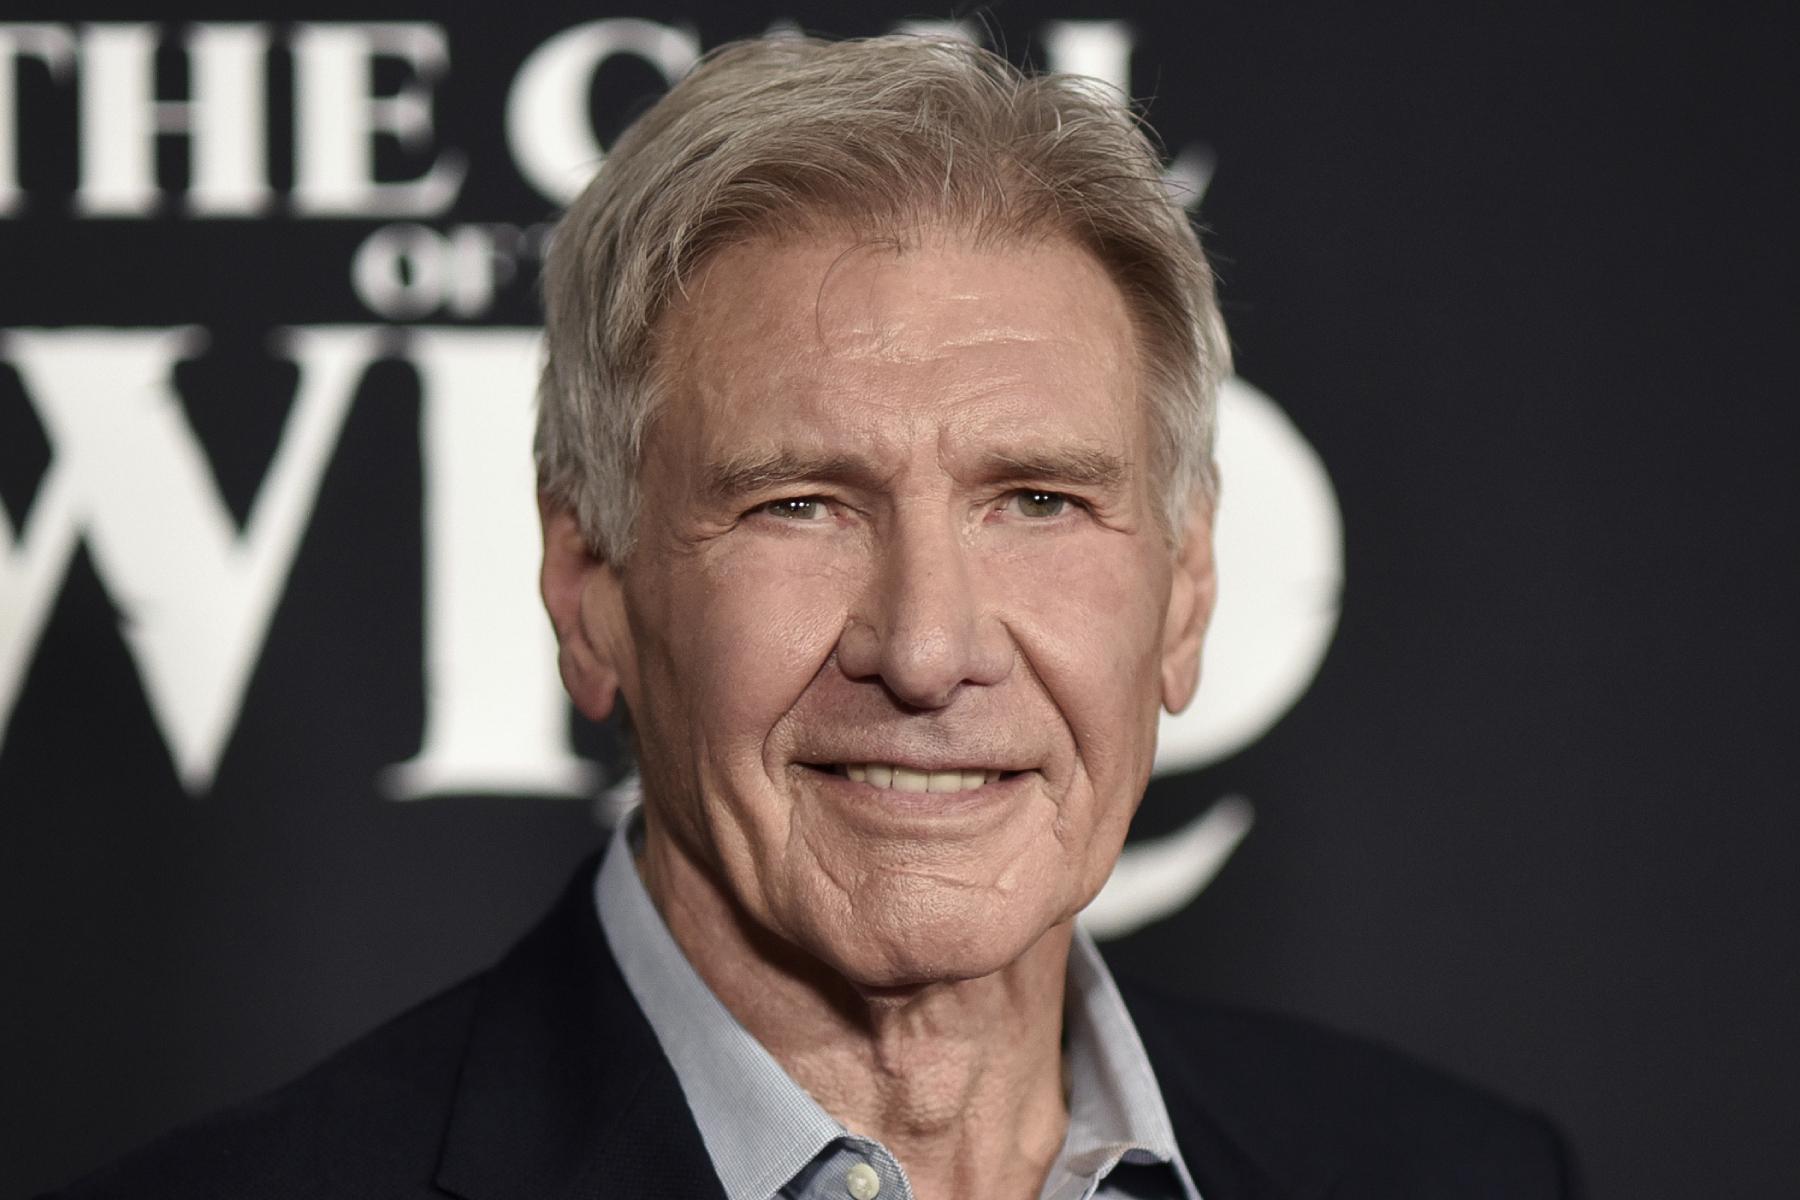 Harrison Ford Injured While Making 'Indiana Jones 5' - Rolling Stone